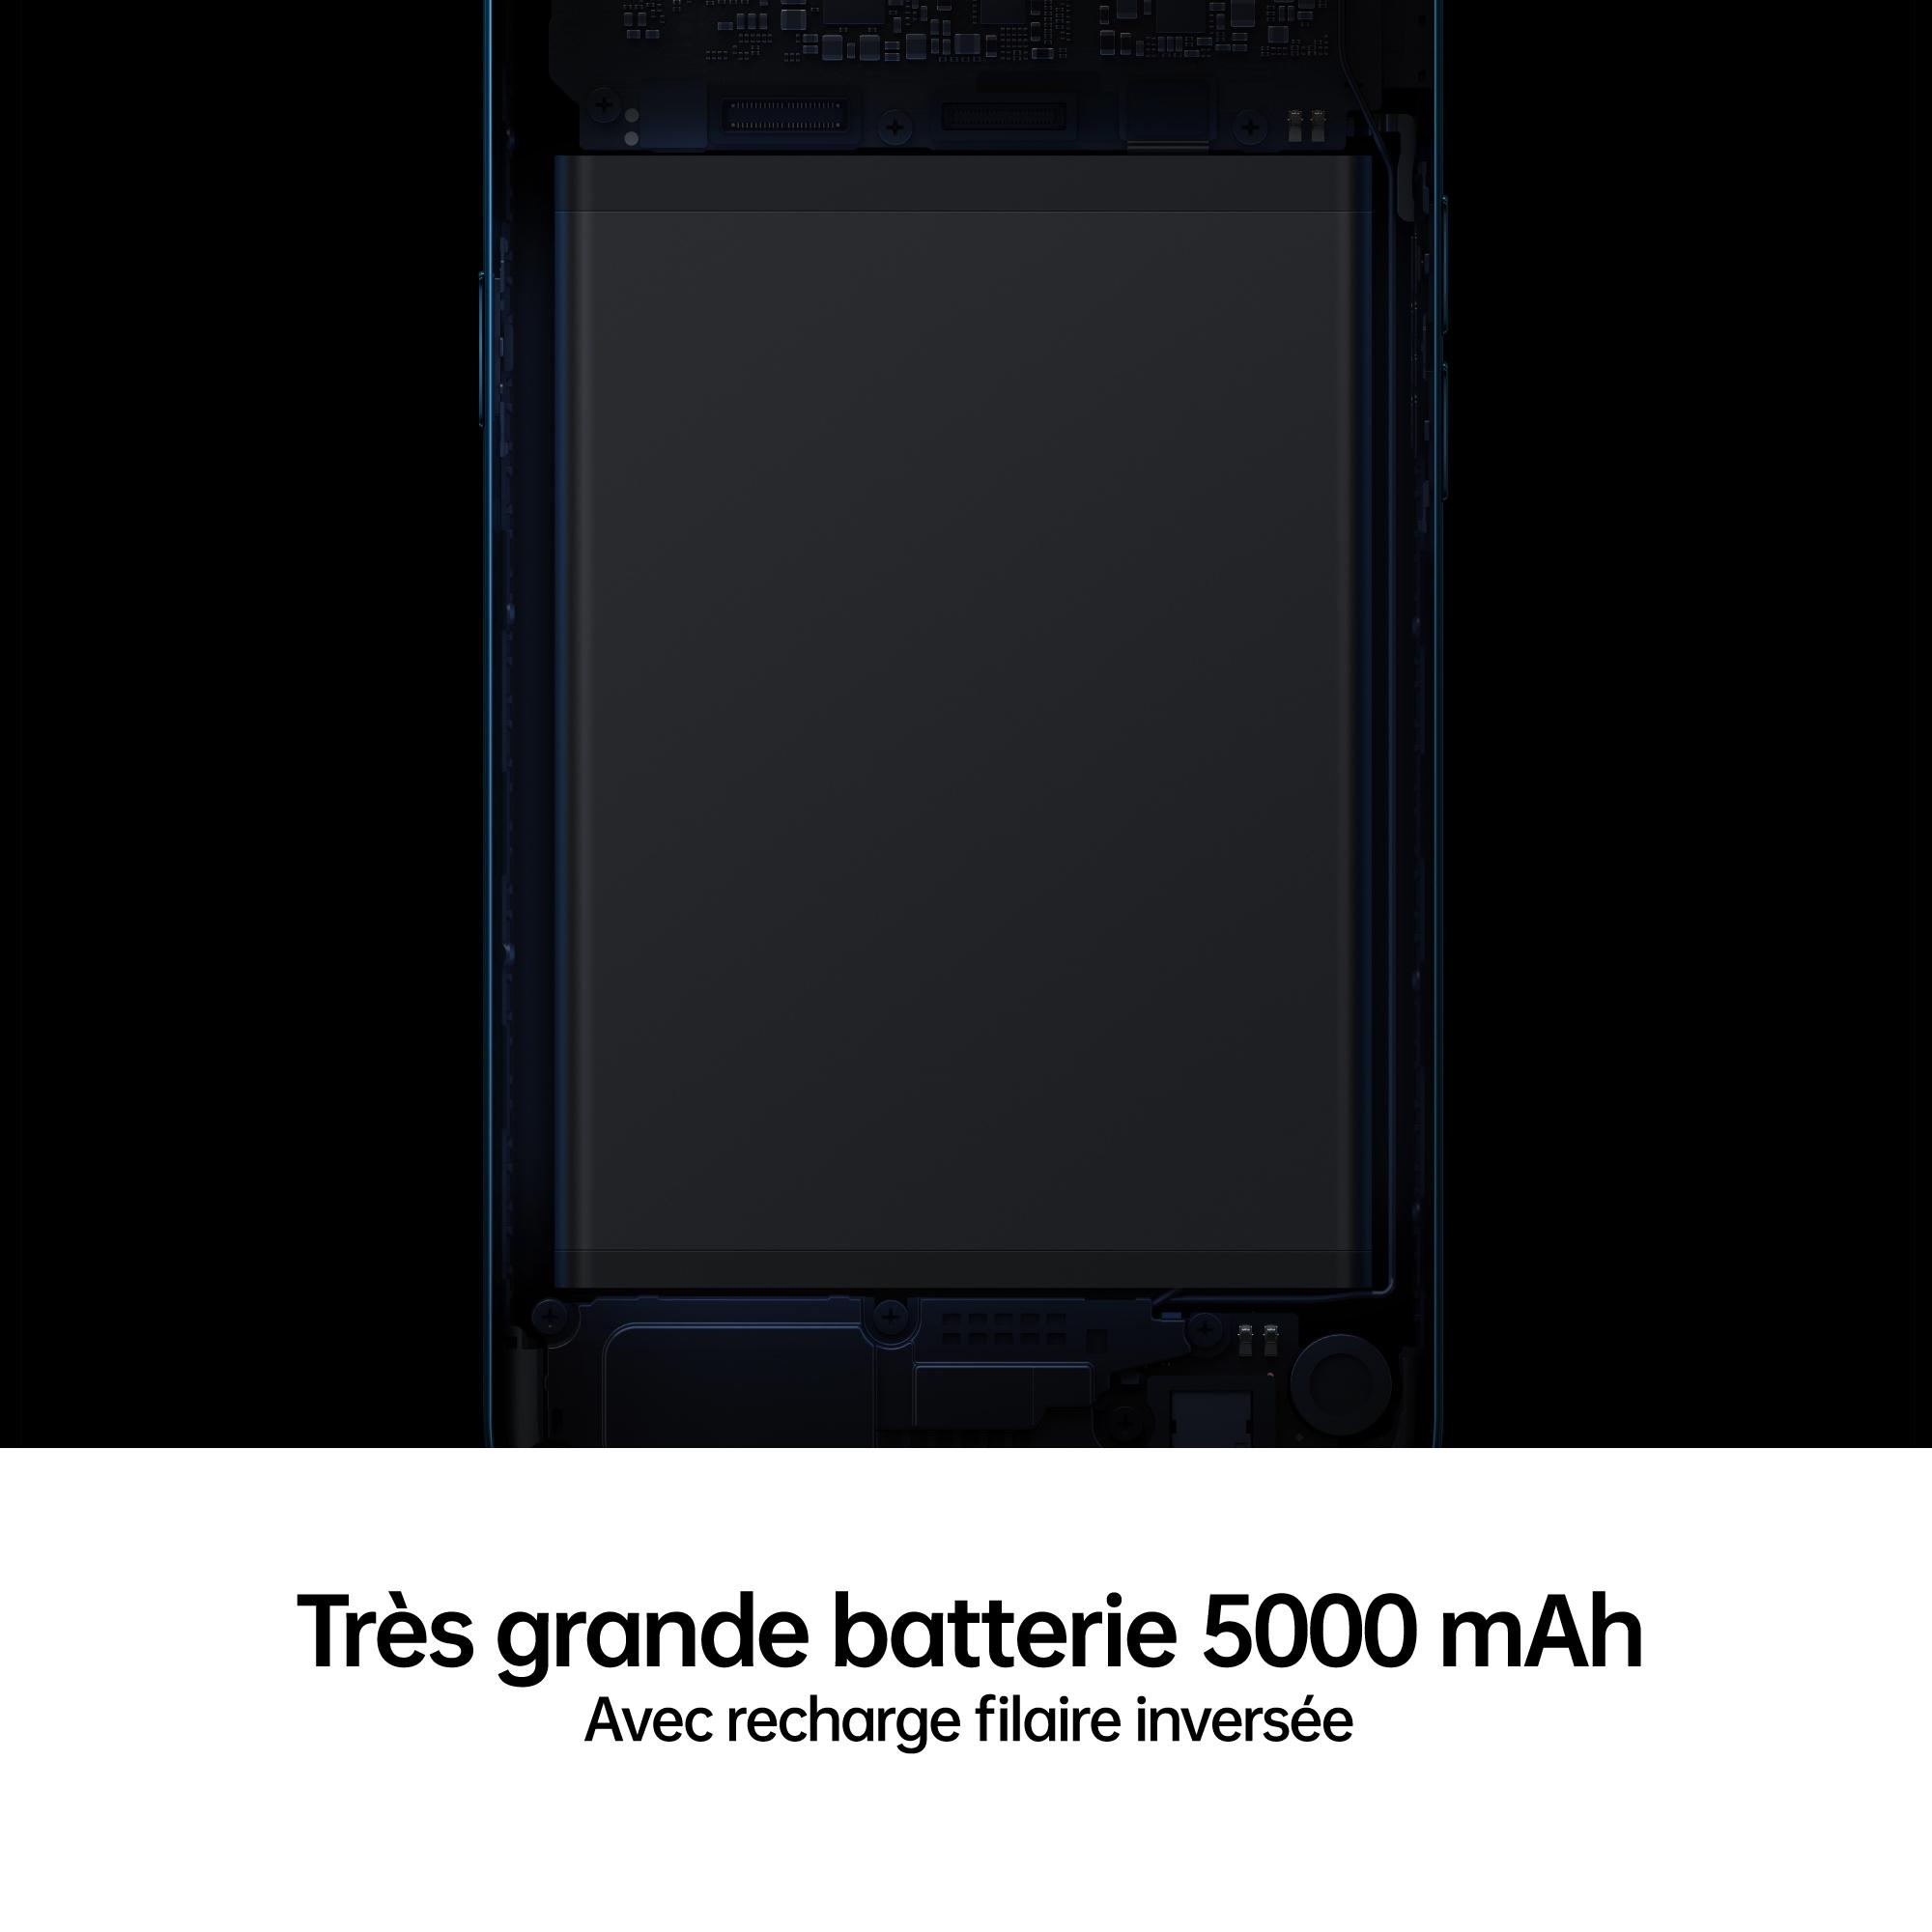 OPPO A5 2020 Noir Onyx Batterie 5000 mAh Sortie Stéréo